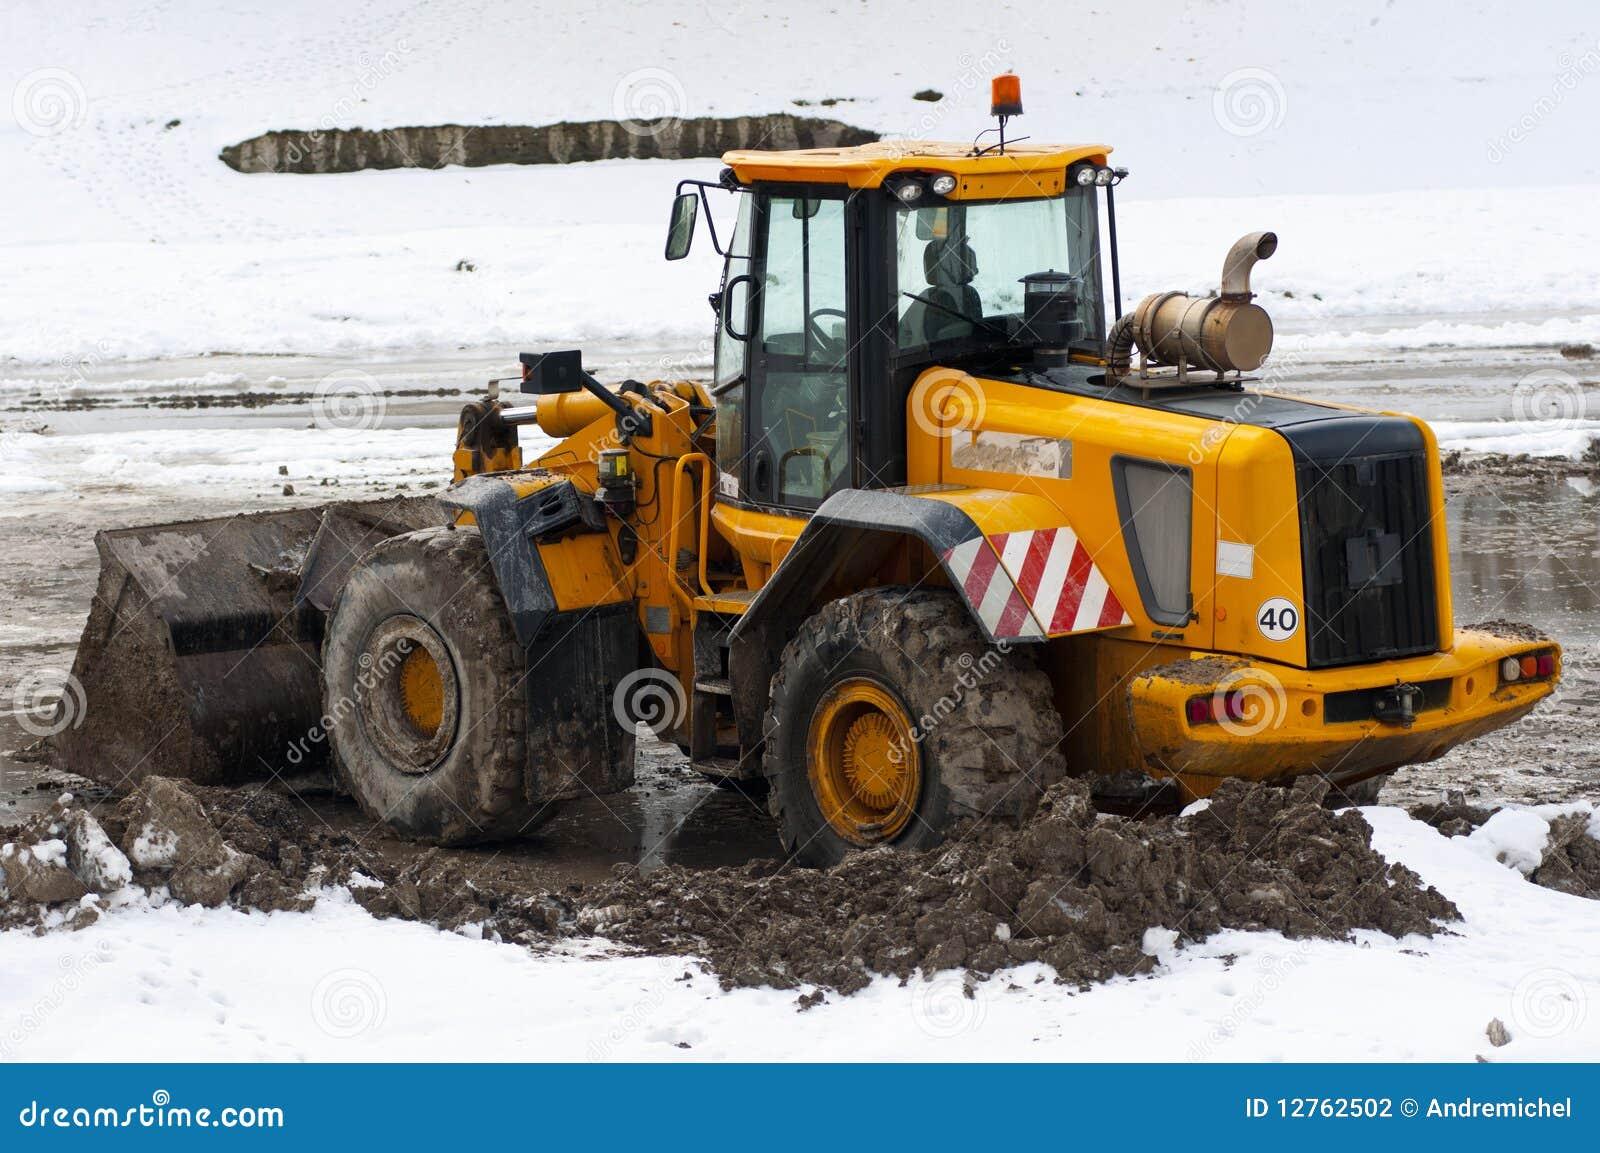 Bull dozer deep in mud and snow